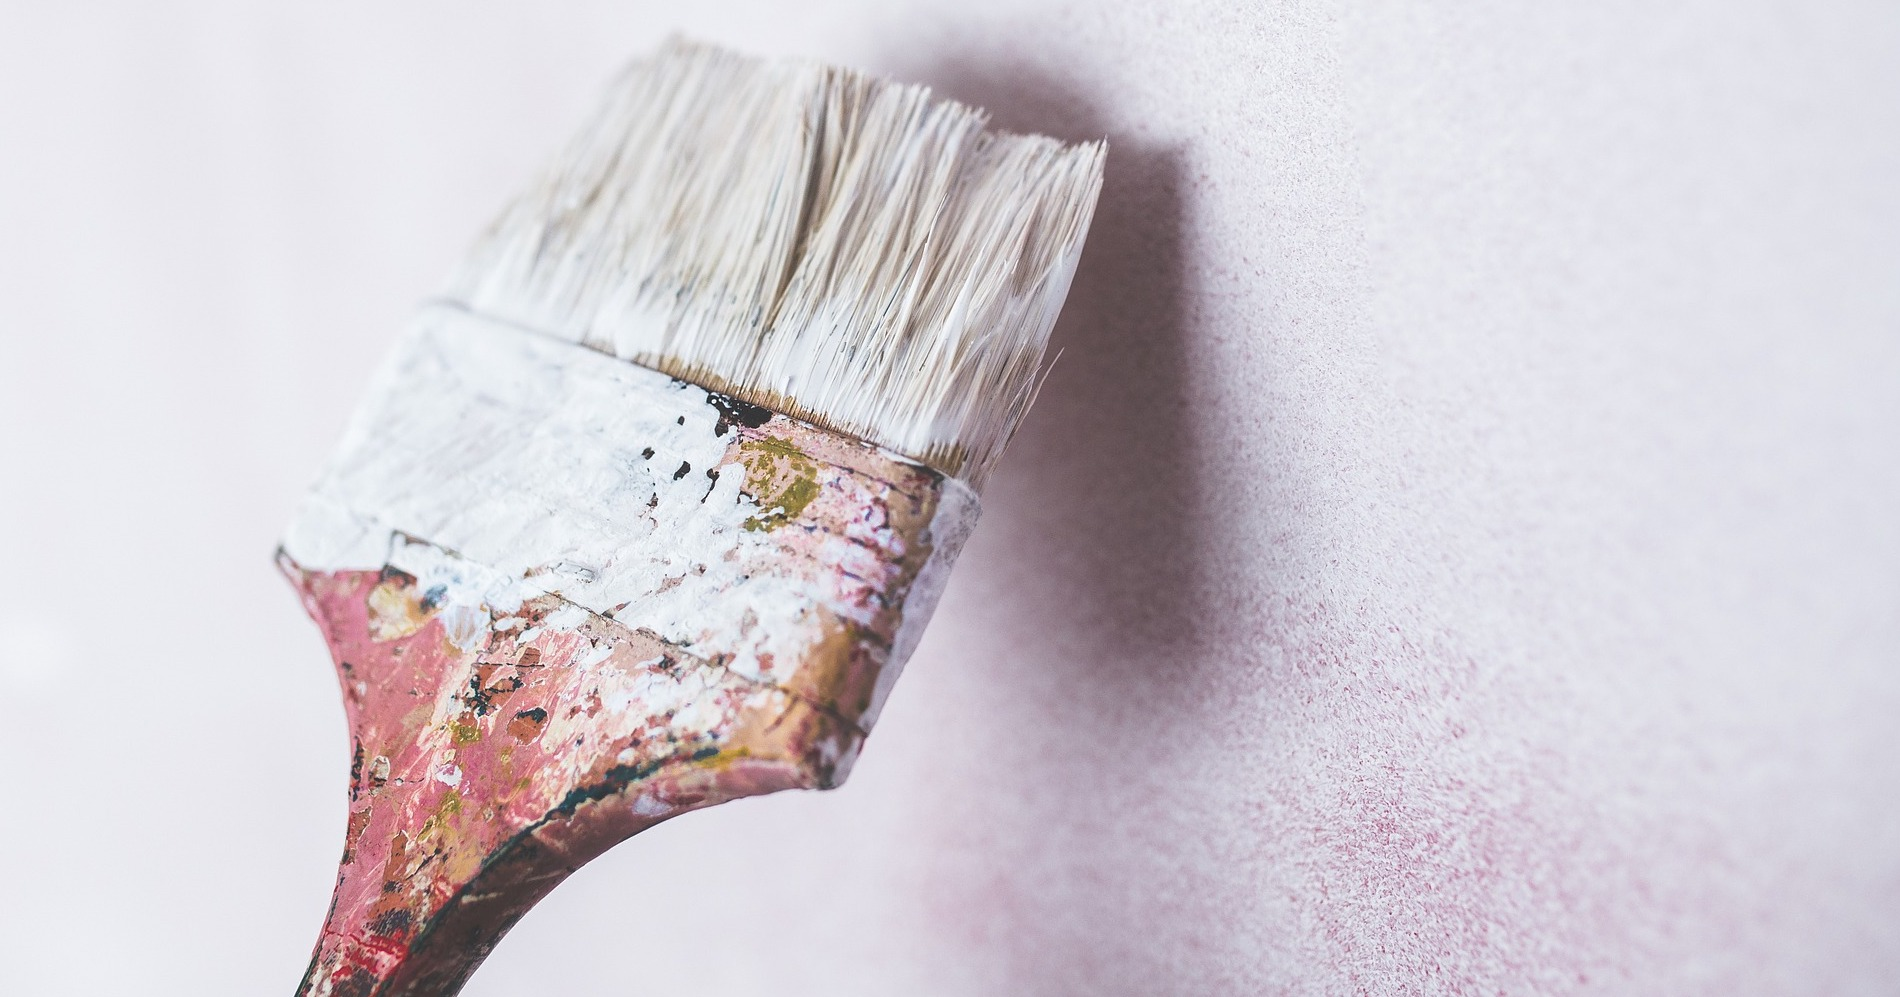 paint per square meter cost